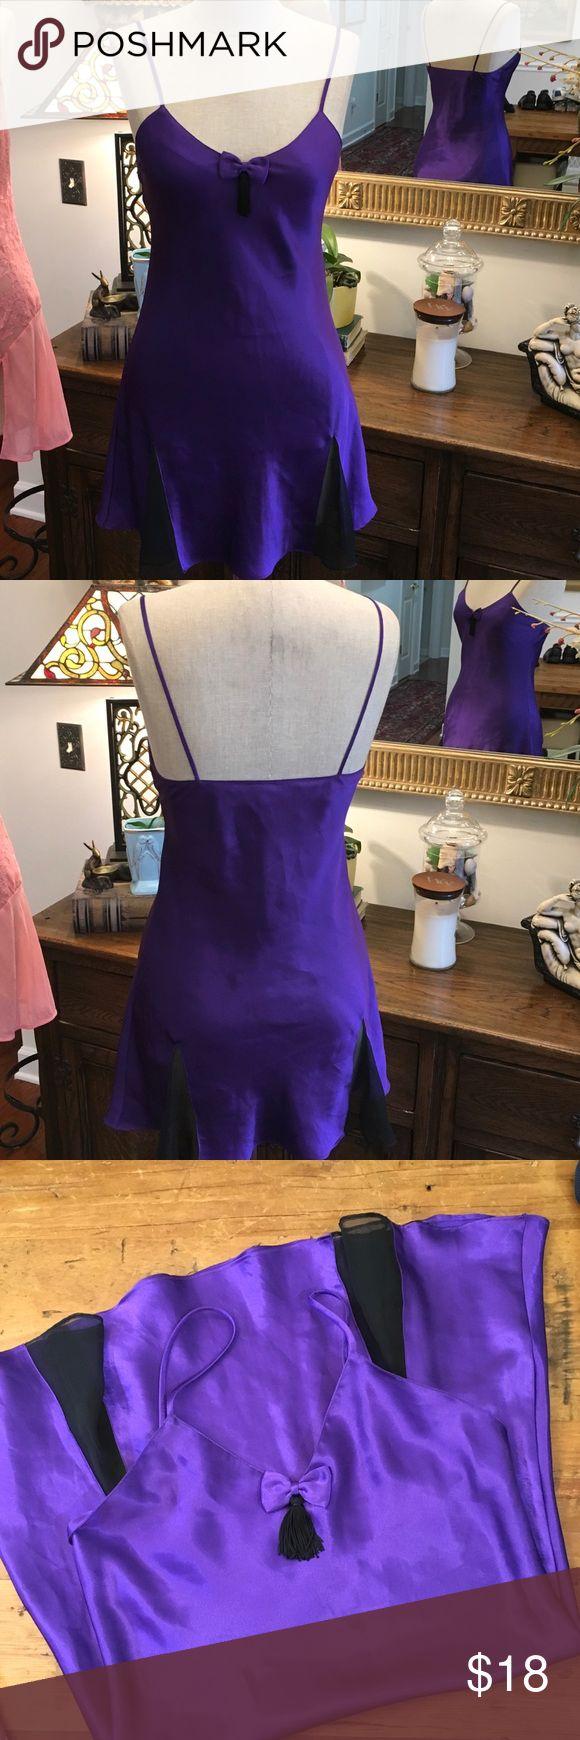 VS VINTAGE Purple nighty vintage by Victoria's secret size small petite Victoria's Secret Intimates & Sleepwear Pajamas